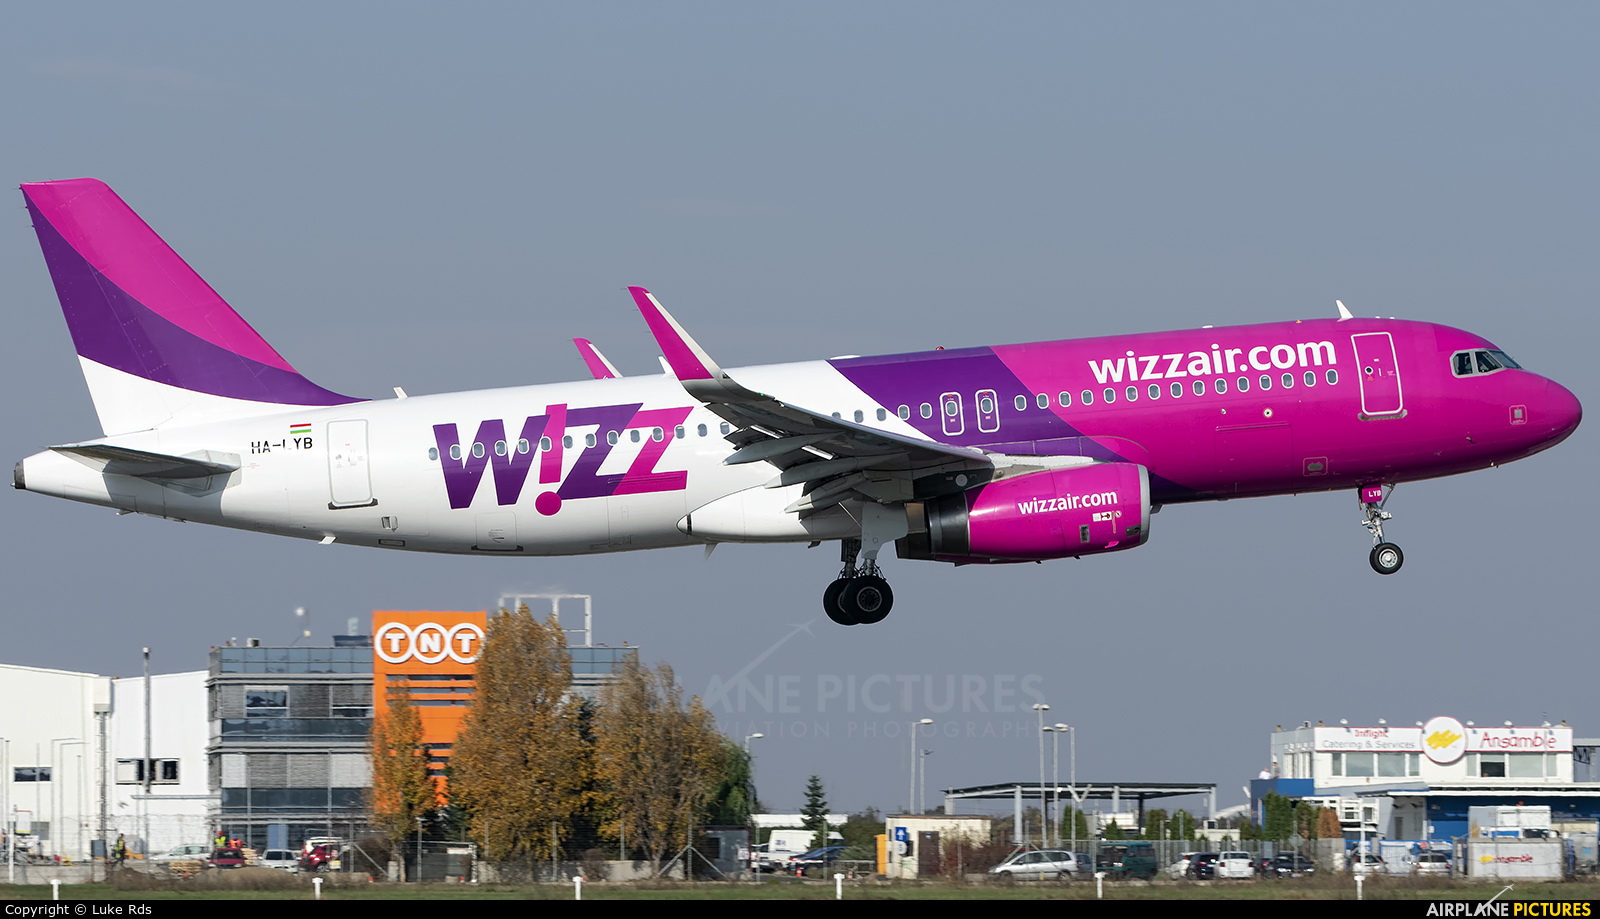 Wizz Air HA-LYB aircraft at Bucharest - Henri Coandă